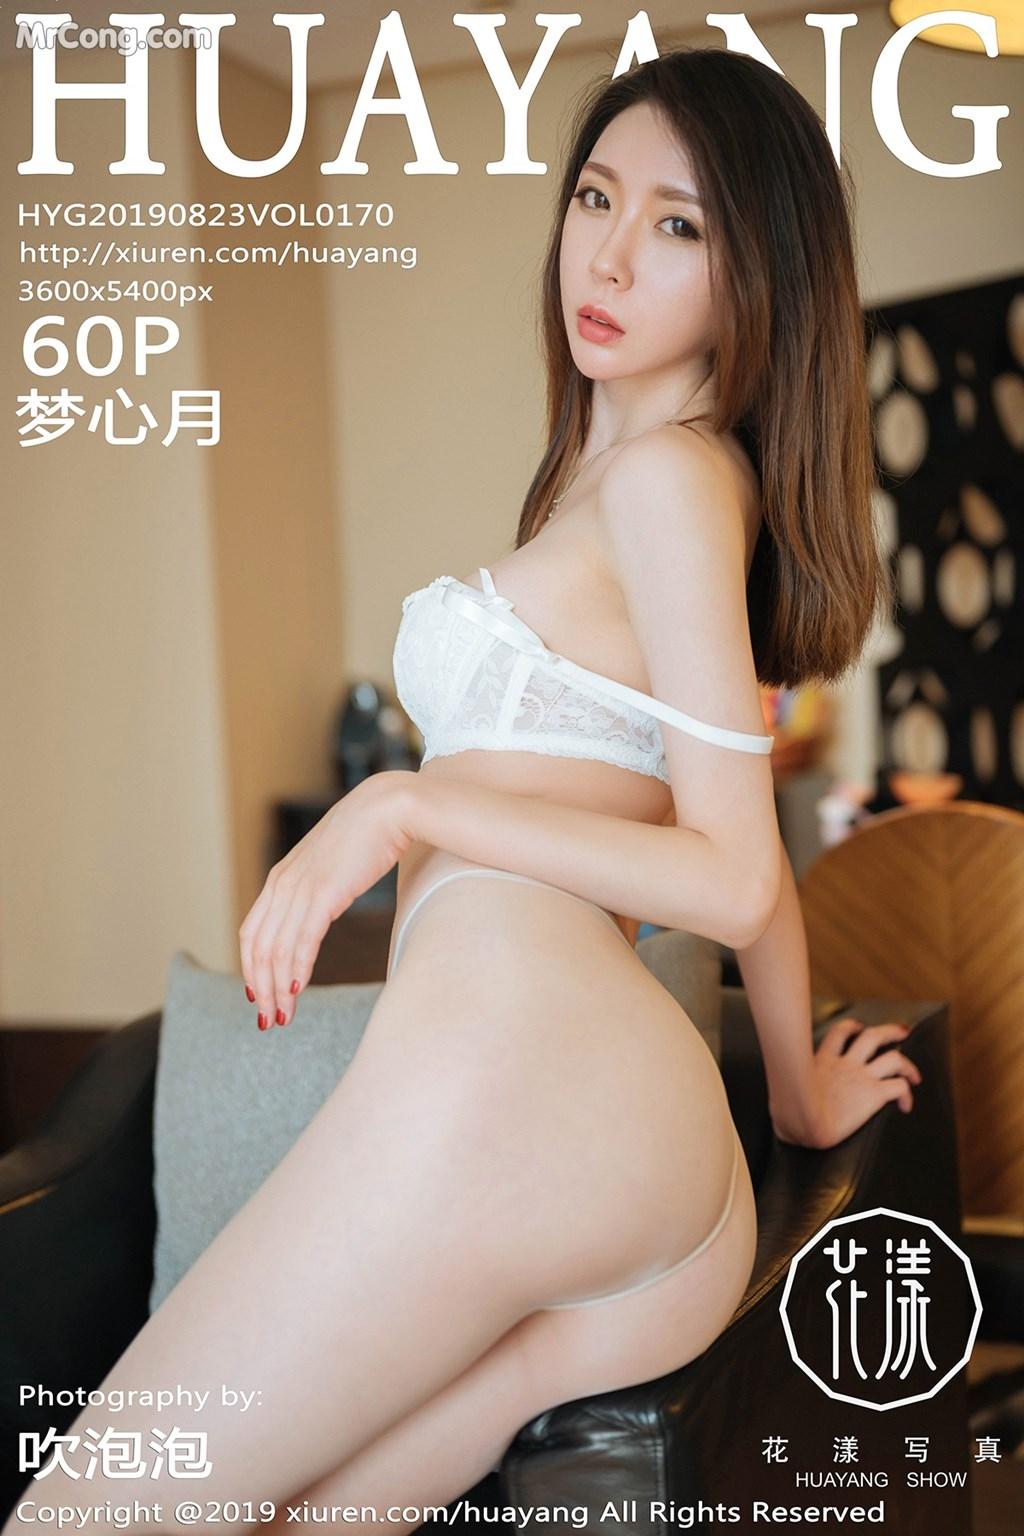 Image HuaYang-Vol.170-Meng-Xin-Yue-MrCong.com-061 in post HuaYang Vol.170: Meng Xin Yue (梦心月) (61 ảnh)